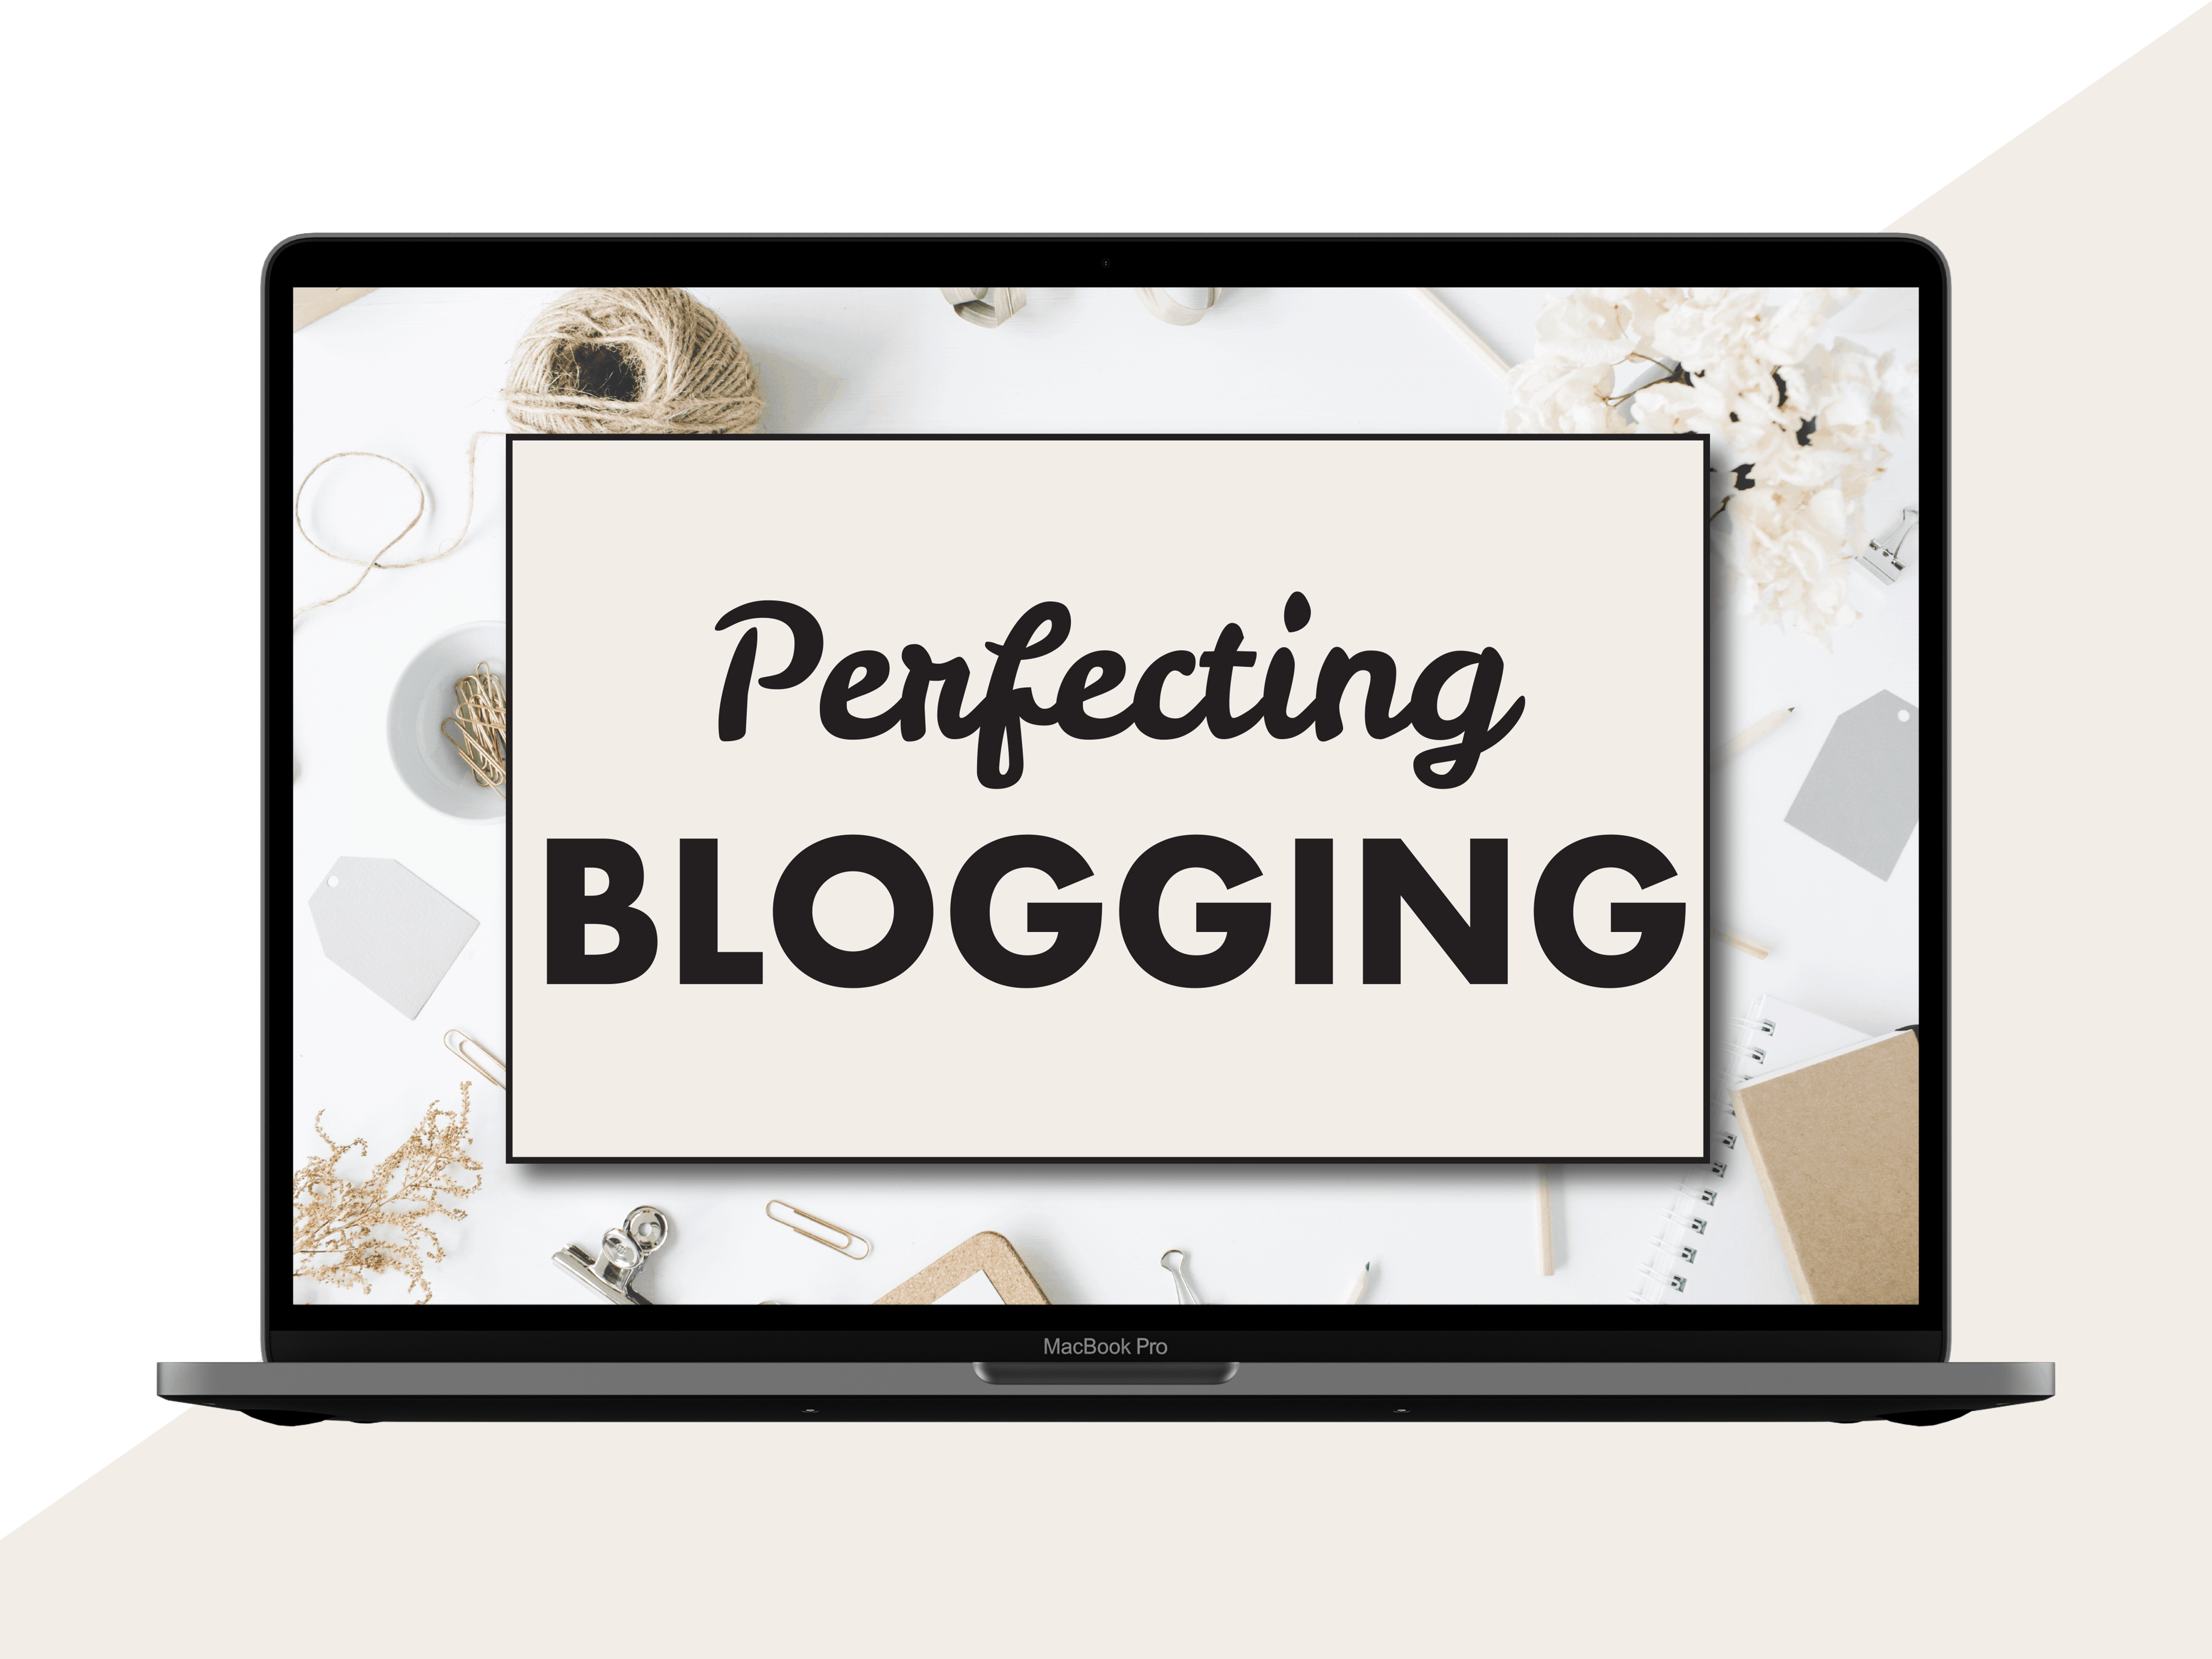 perfecting blogging by sophia lee